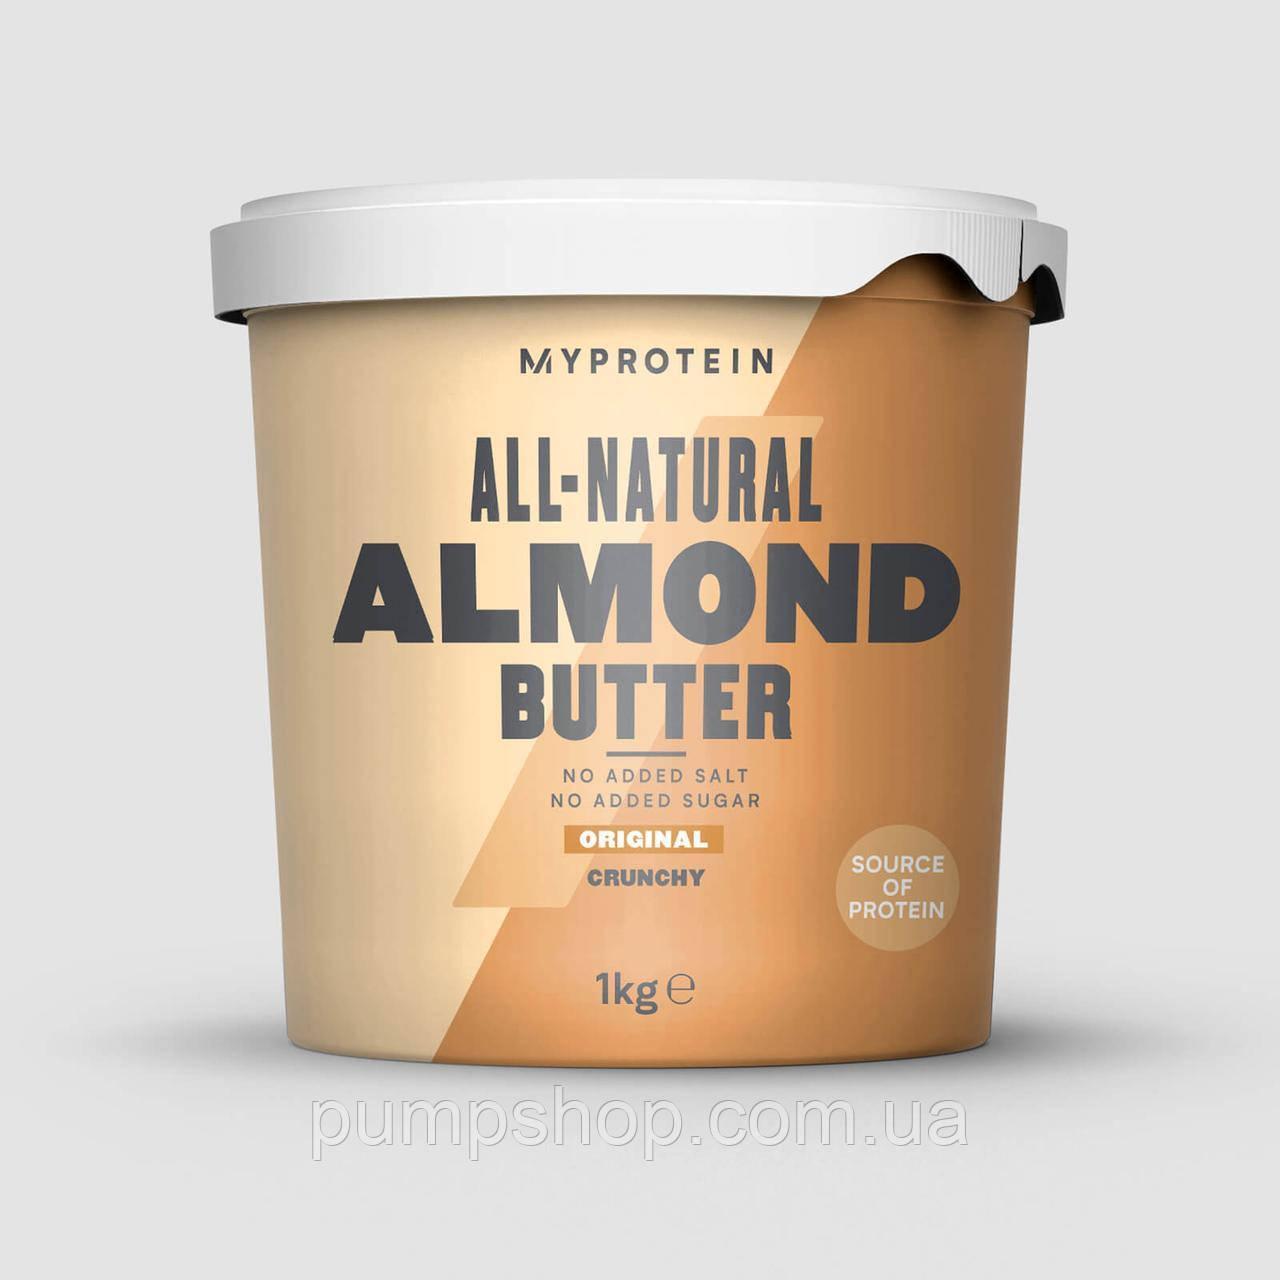 Мигдальний паста кранч MyProtein All Natural Crunchy Almond Butter 1 кг